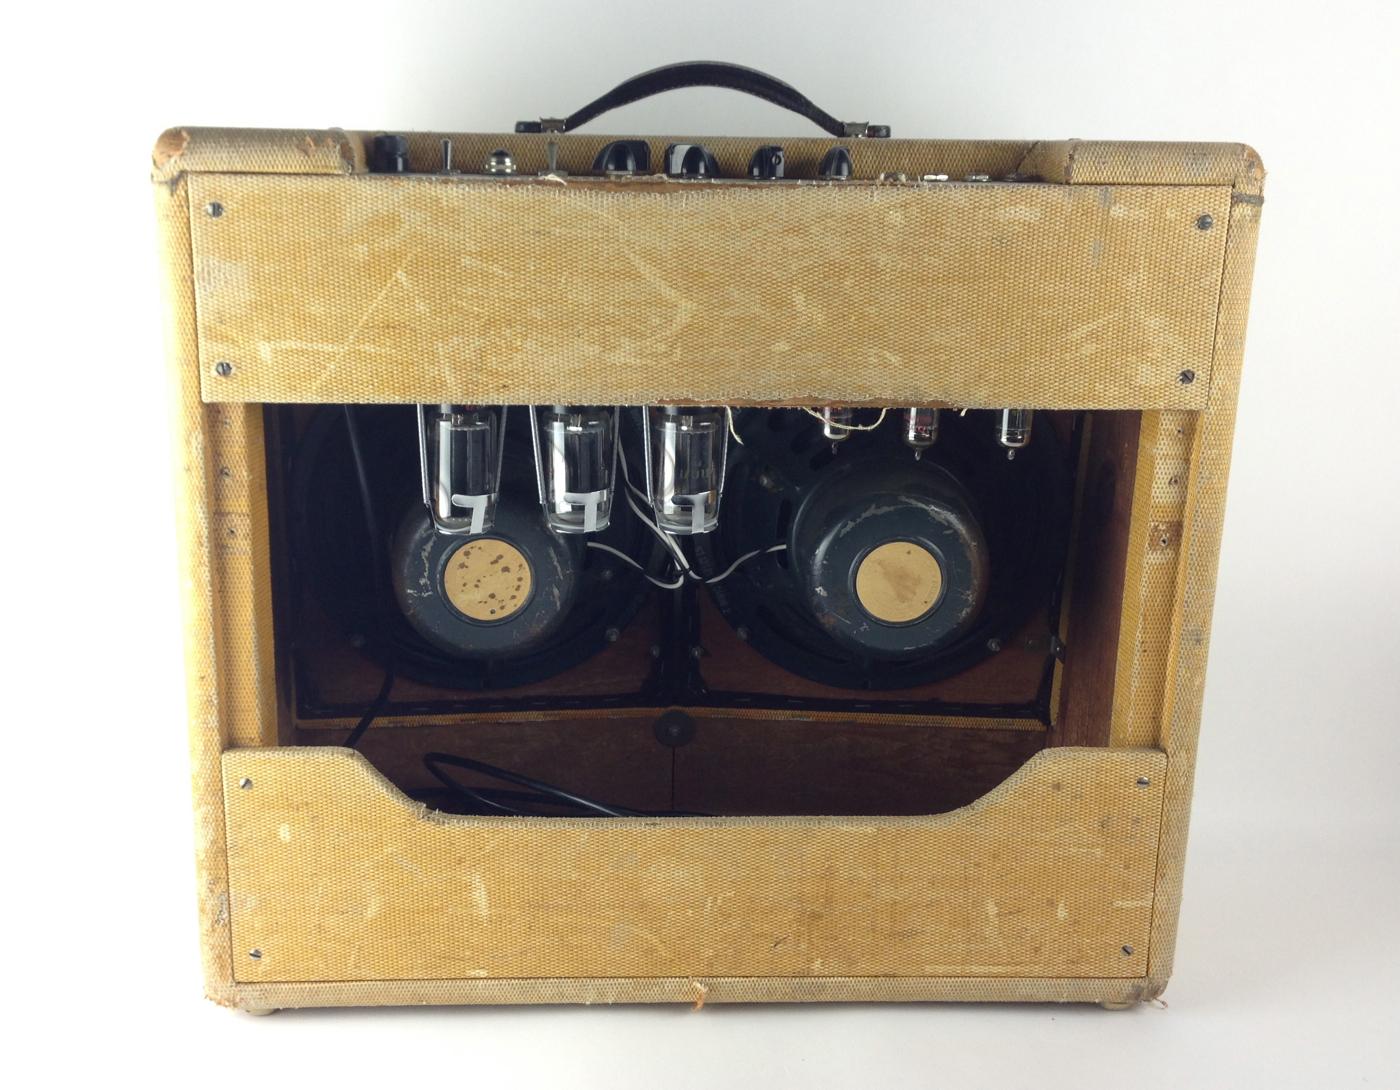 Fender amplifier serial dating 4